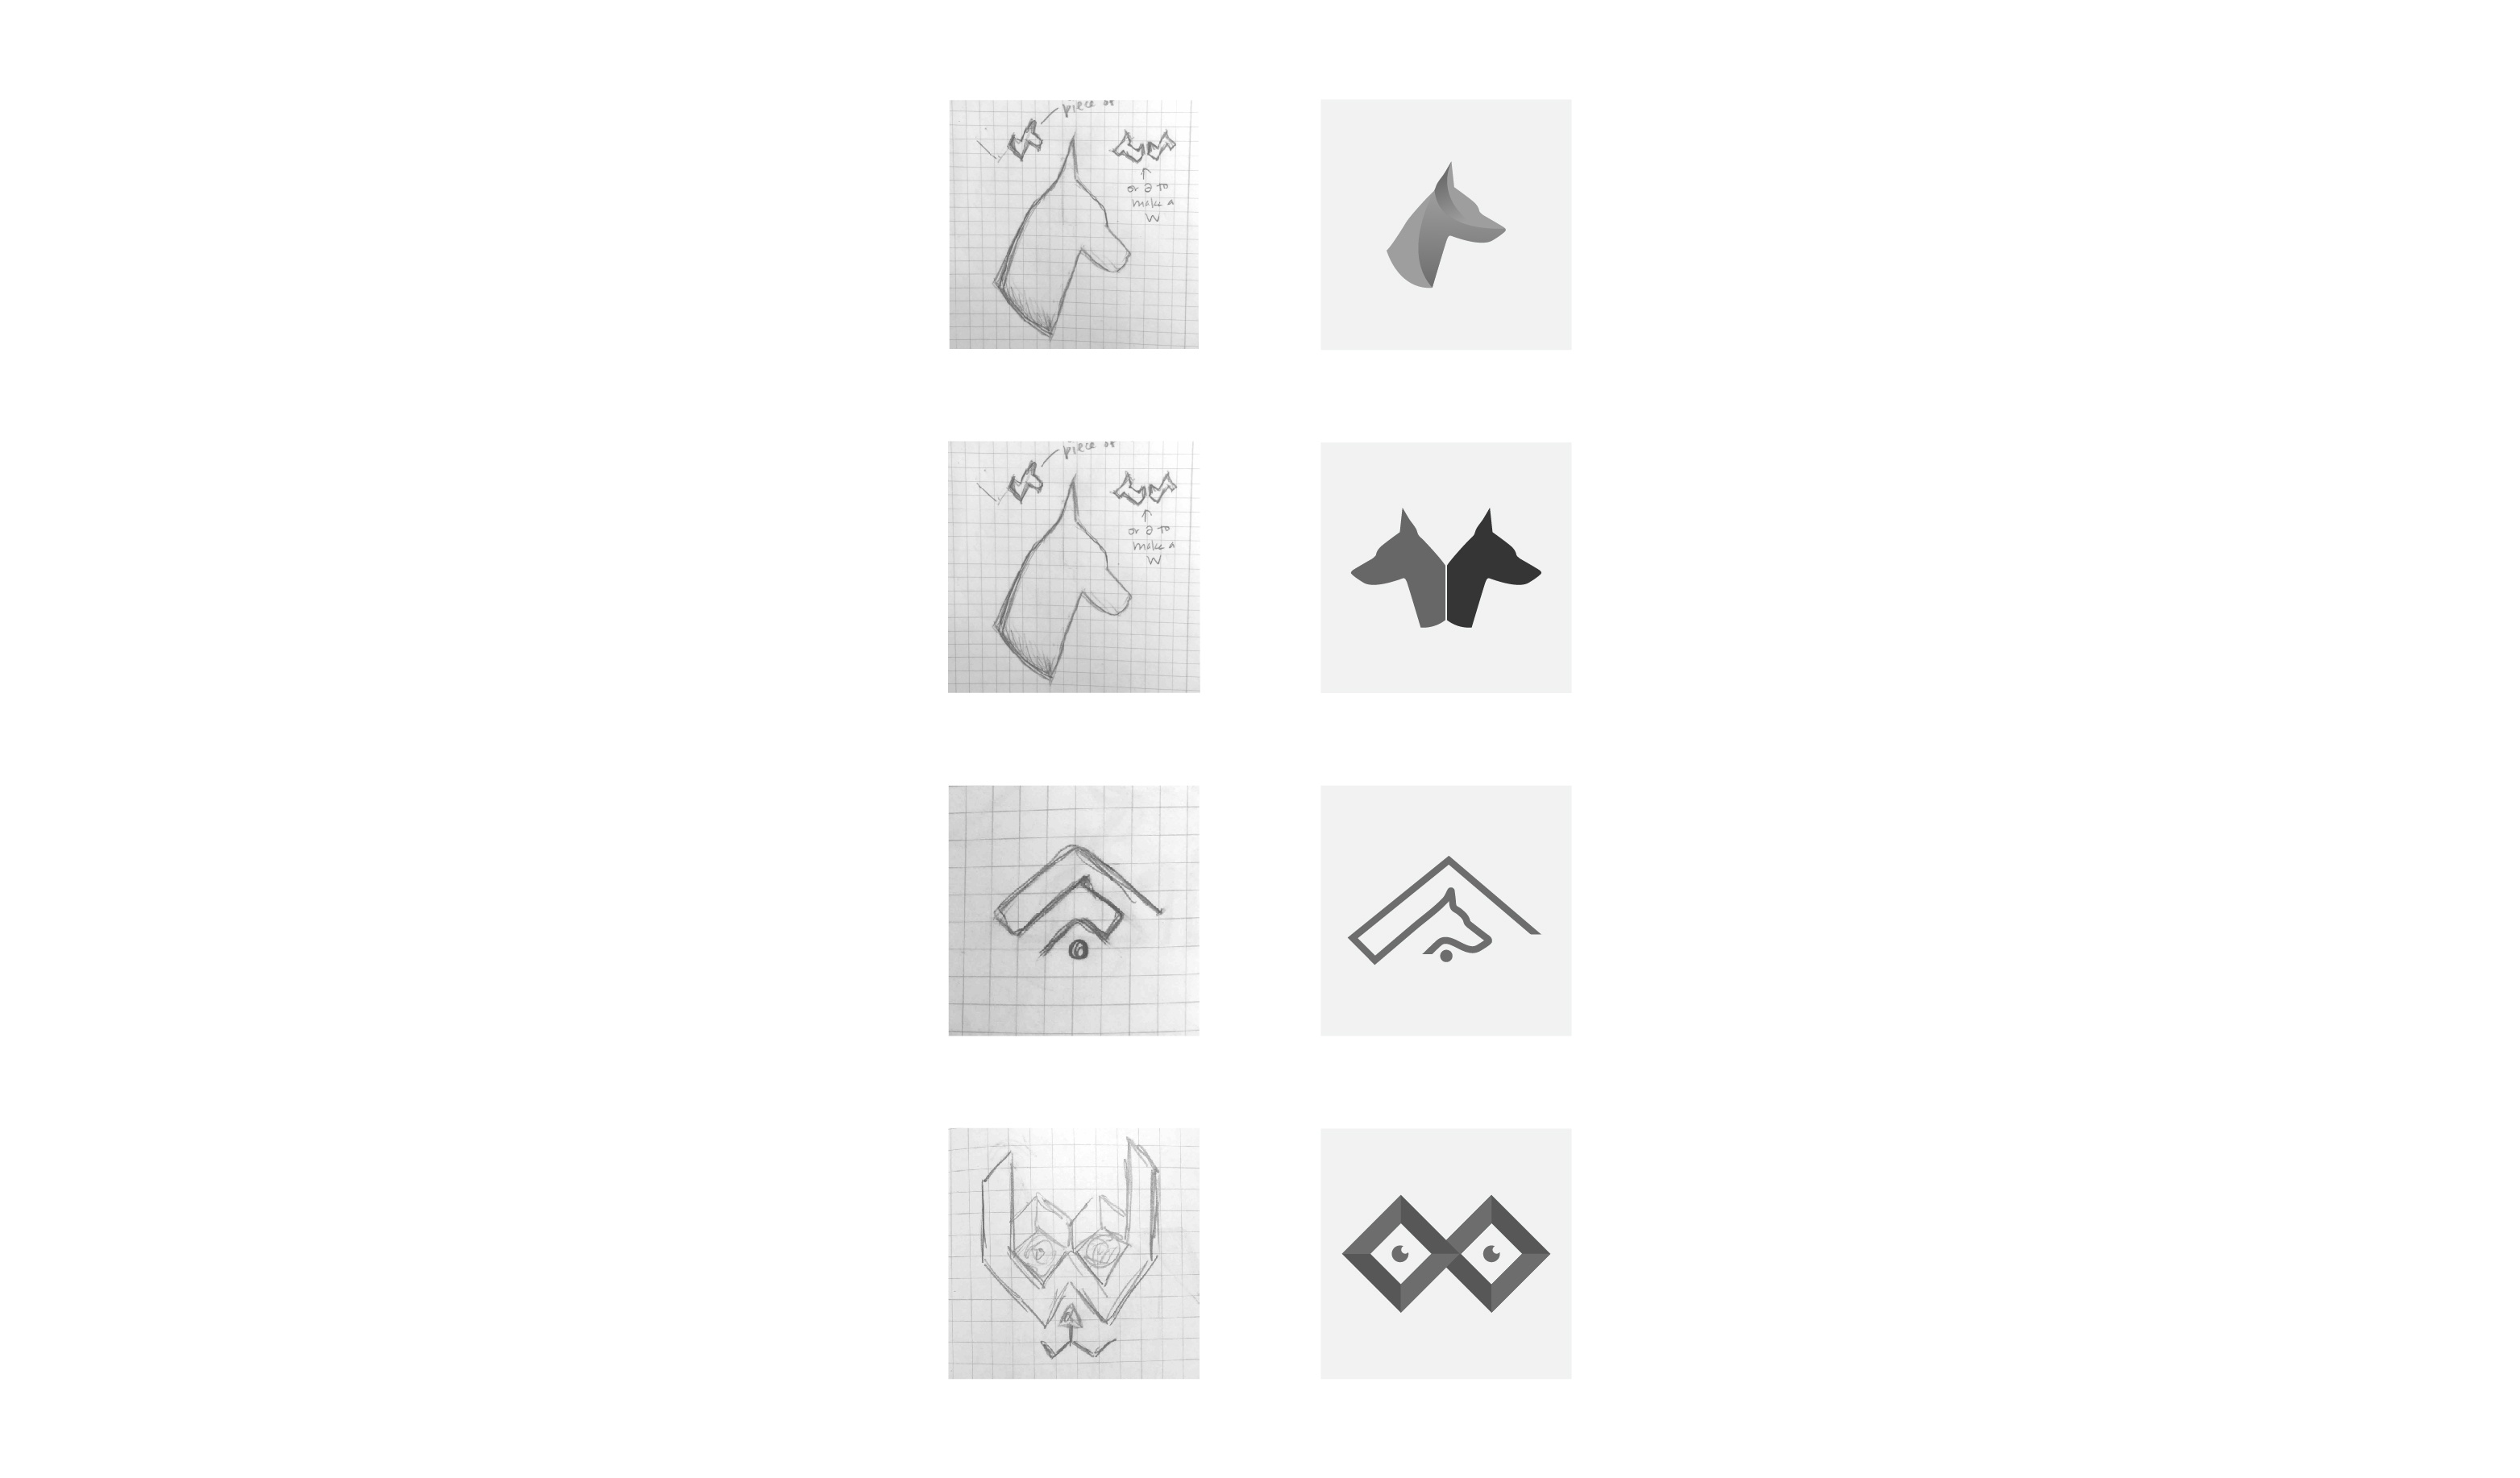 WW_Logo_Redesign_Concept_Sketches-05.jpg